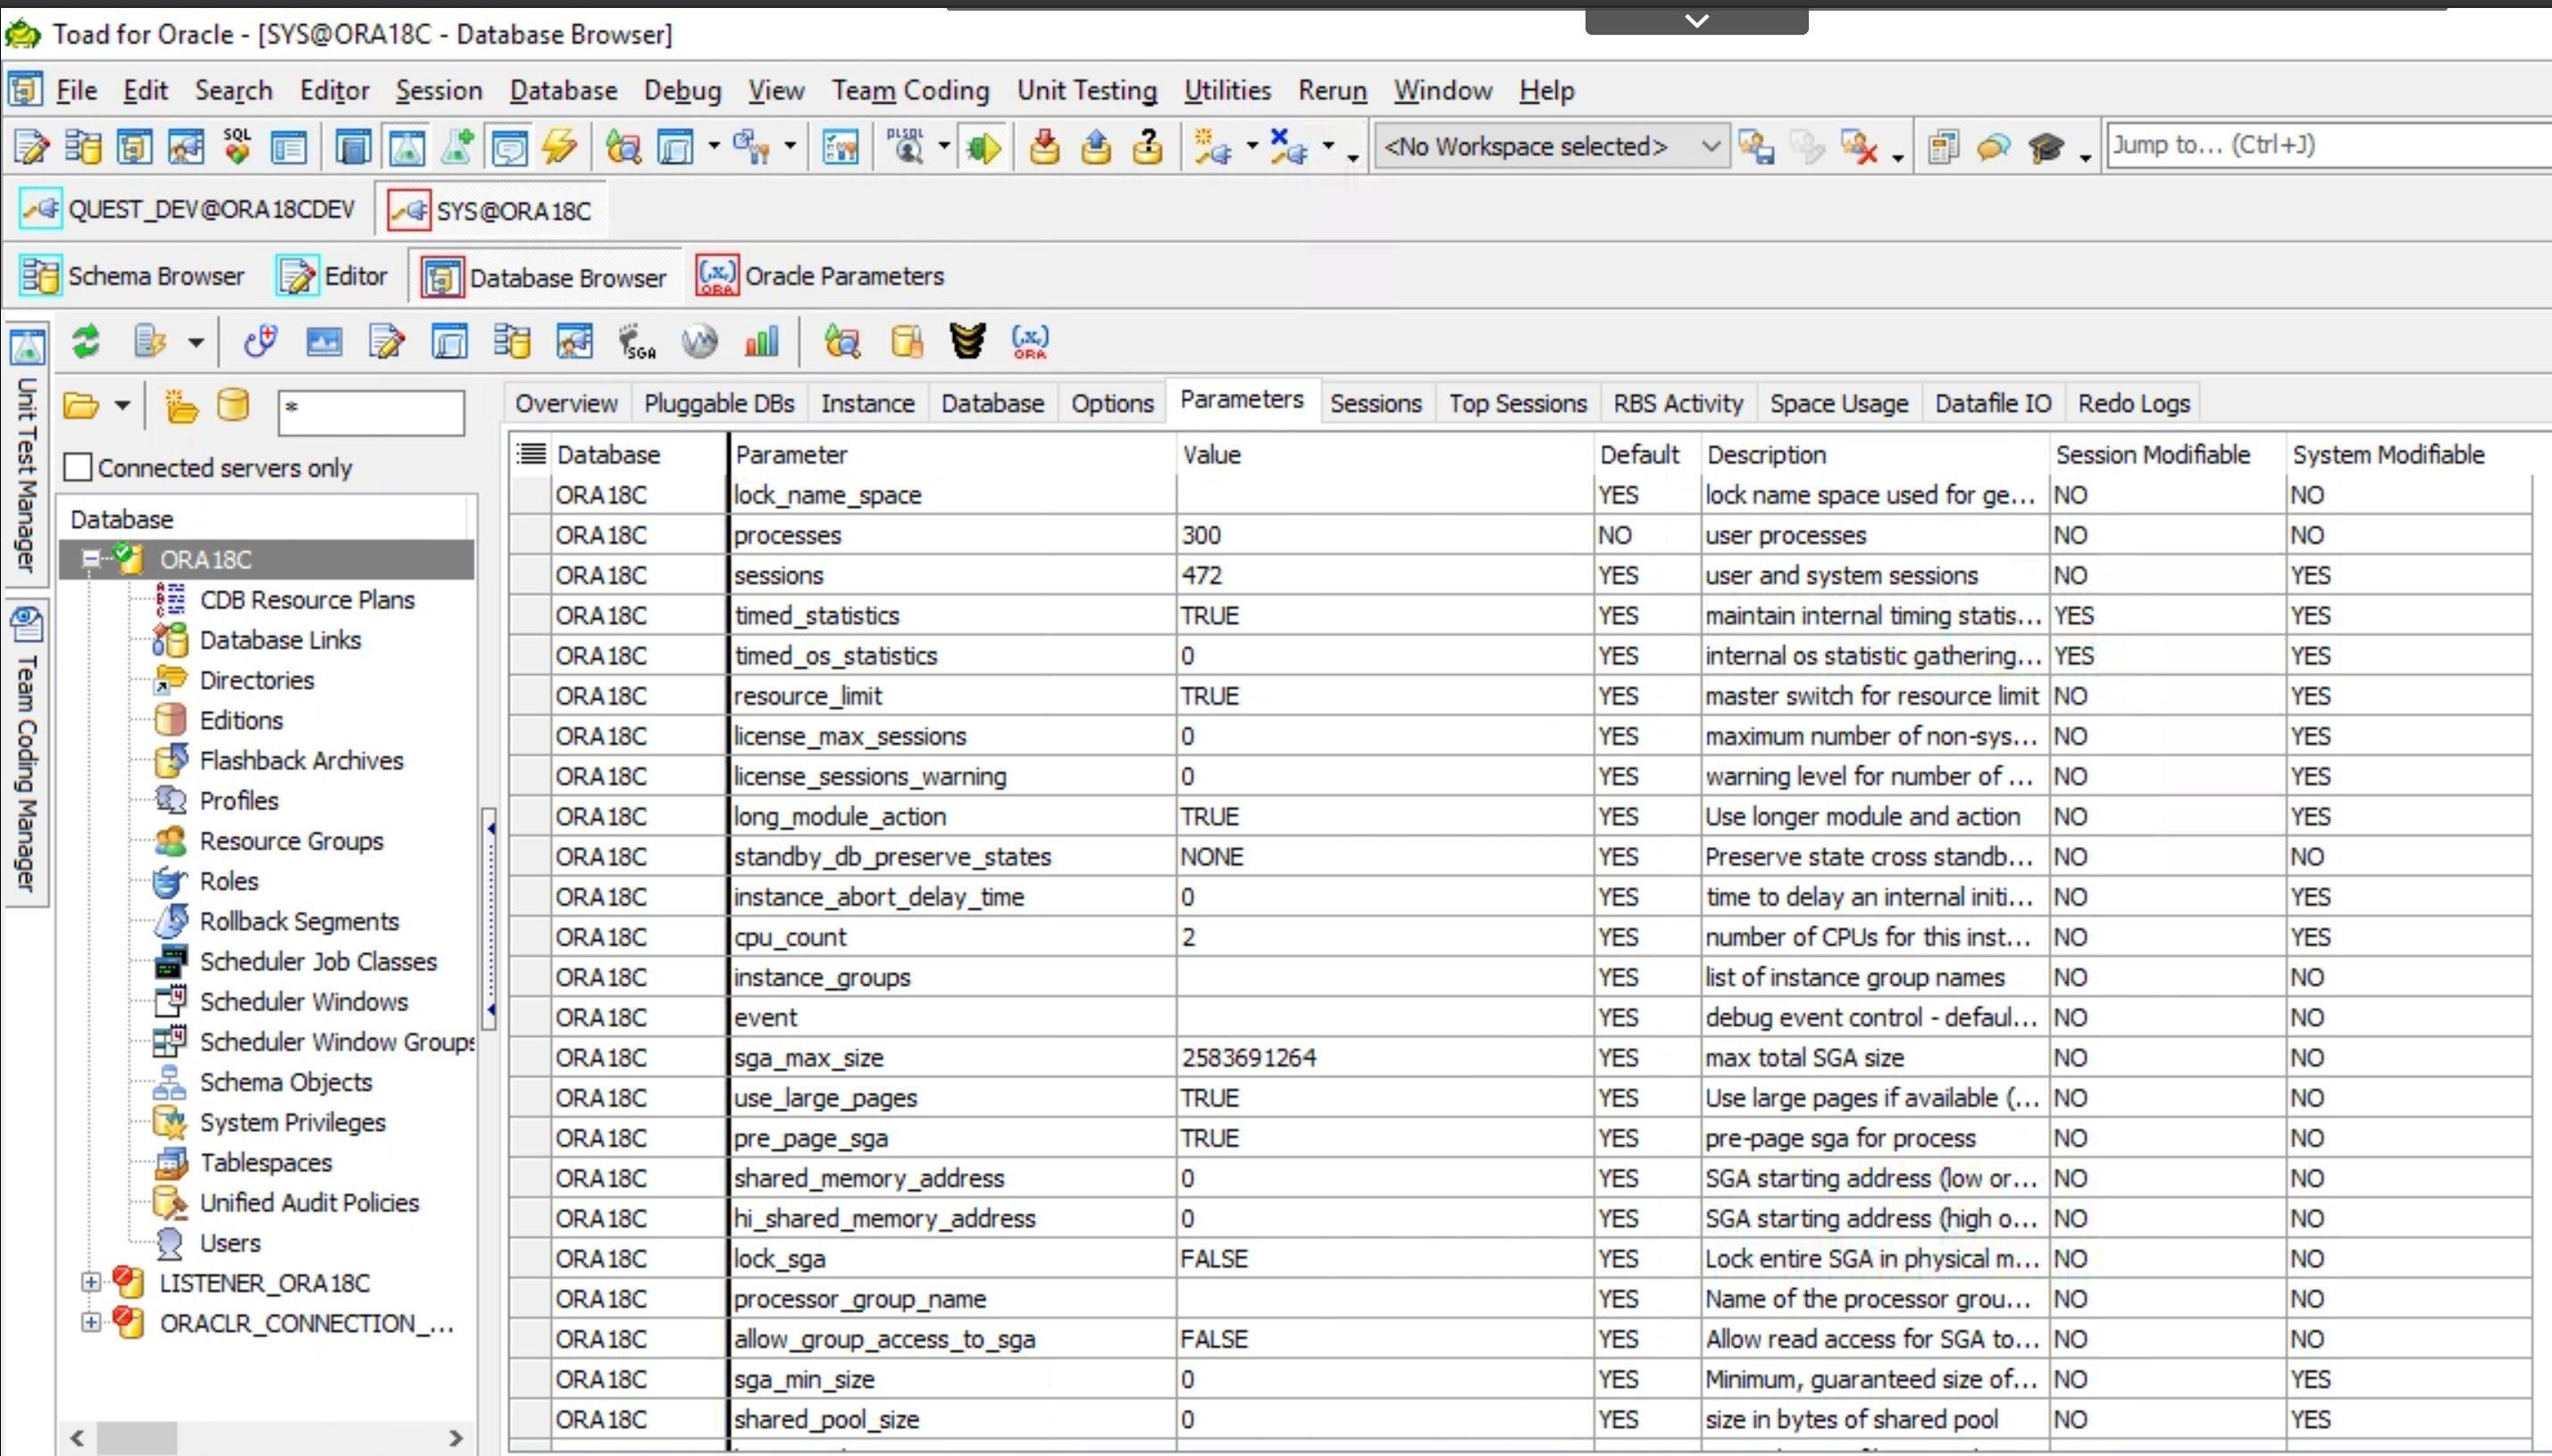 Basic Oracle parameters view.